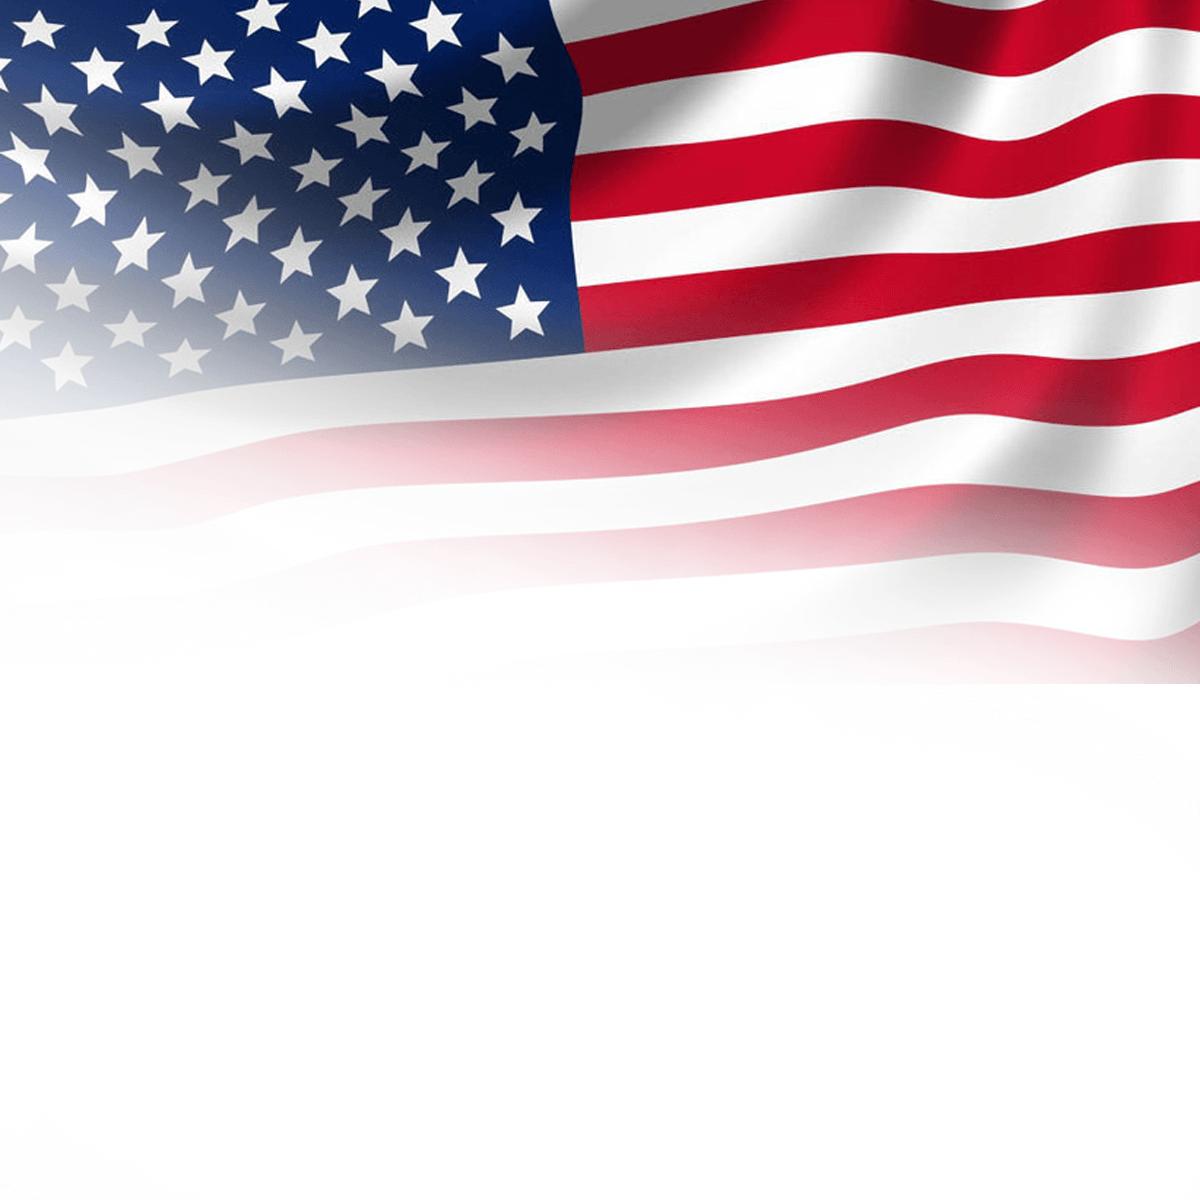 https://myscs.org/wp-content/uploads/2021/06/USA-Flag.png